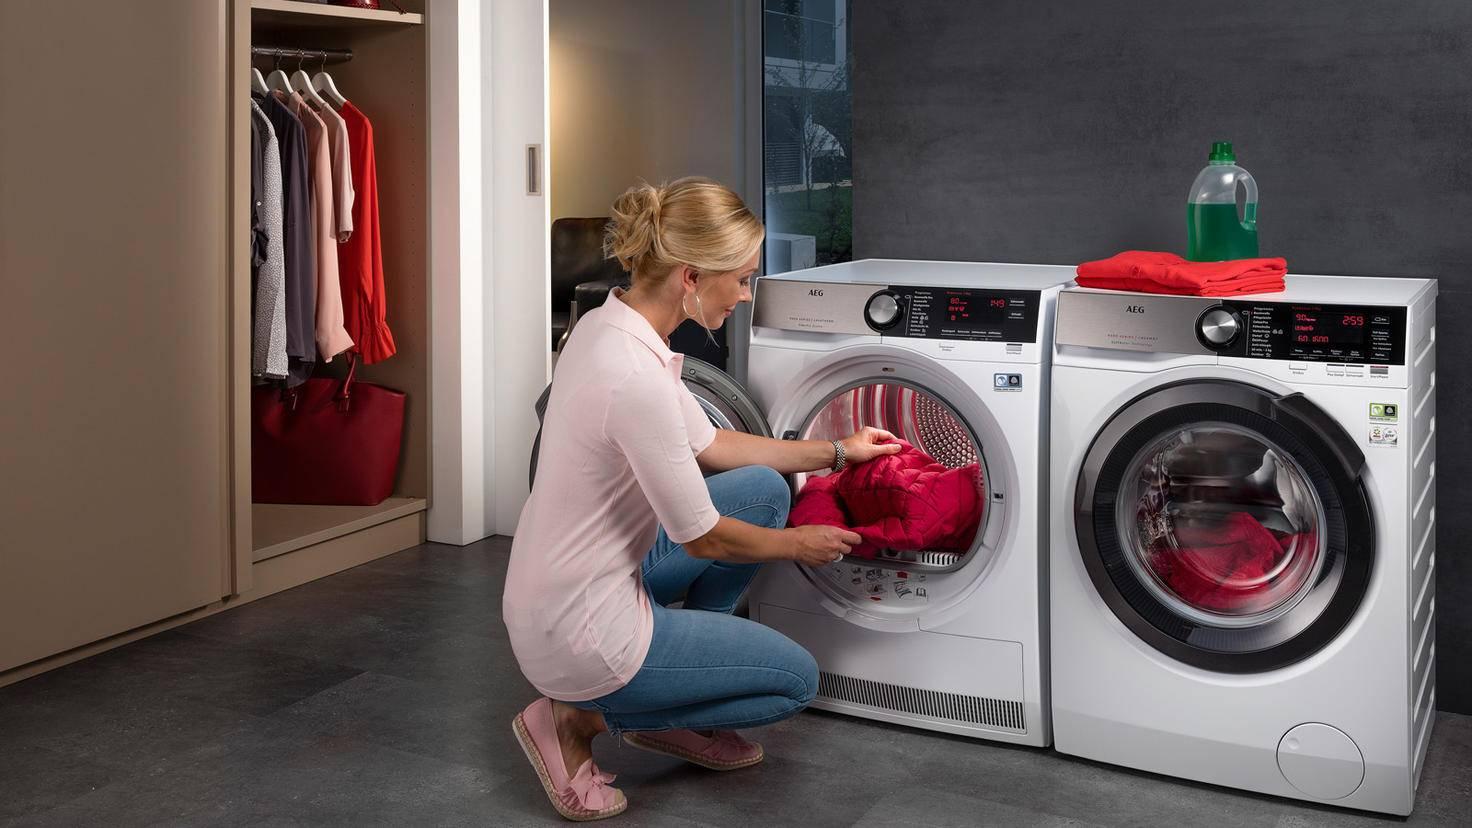 AEG-Waeschetrockner-1-Waschmaschine-mit-AutoDose-1-AEG